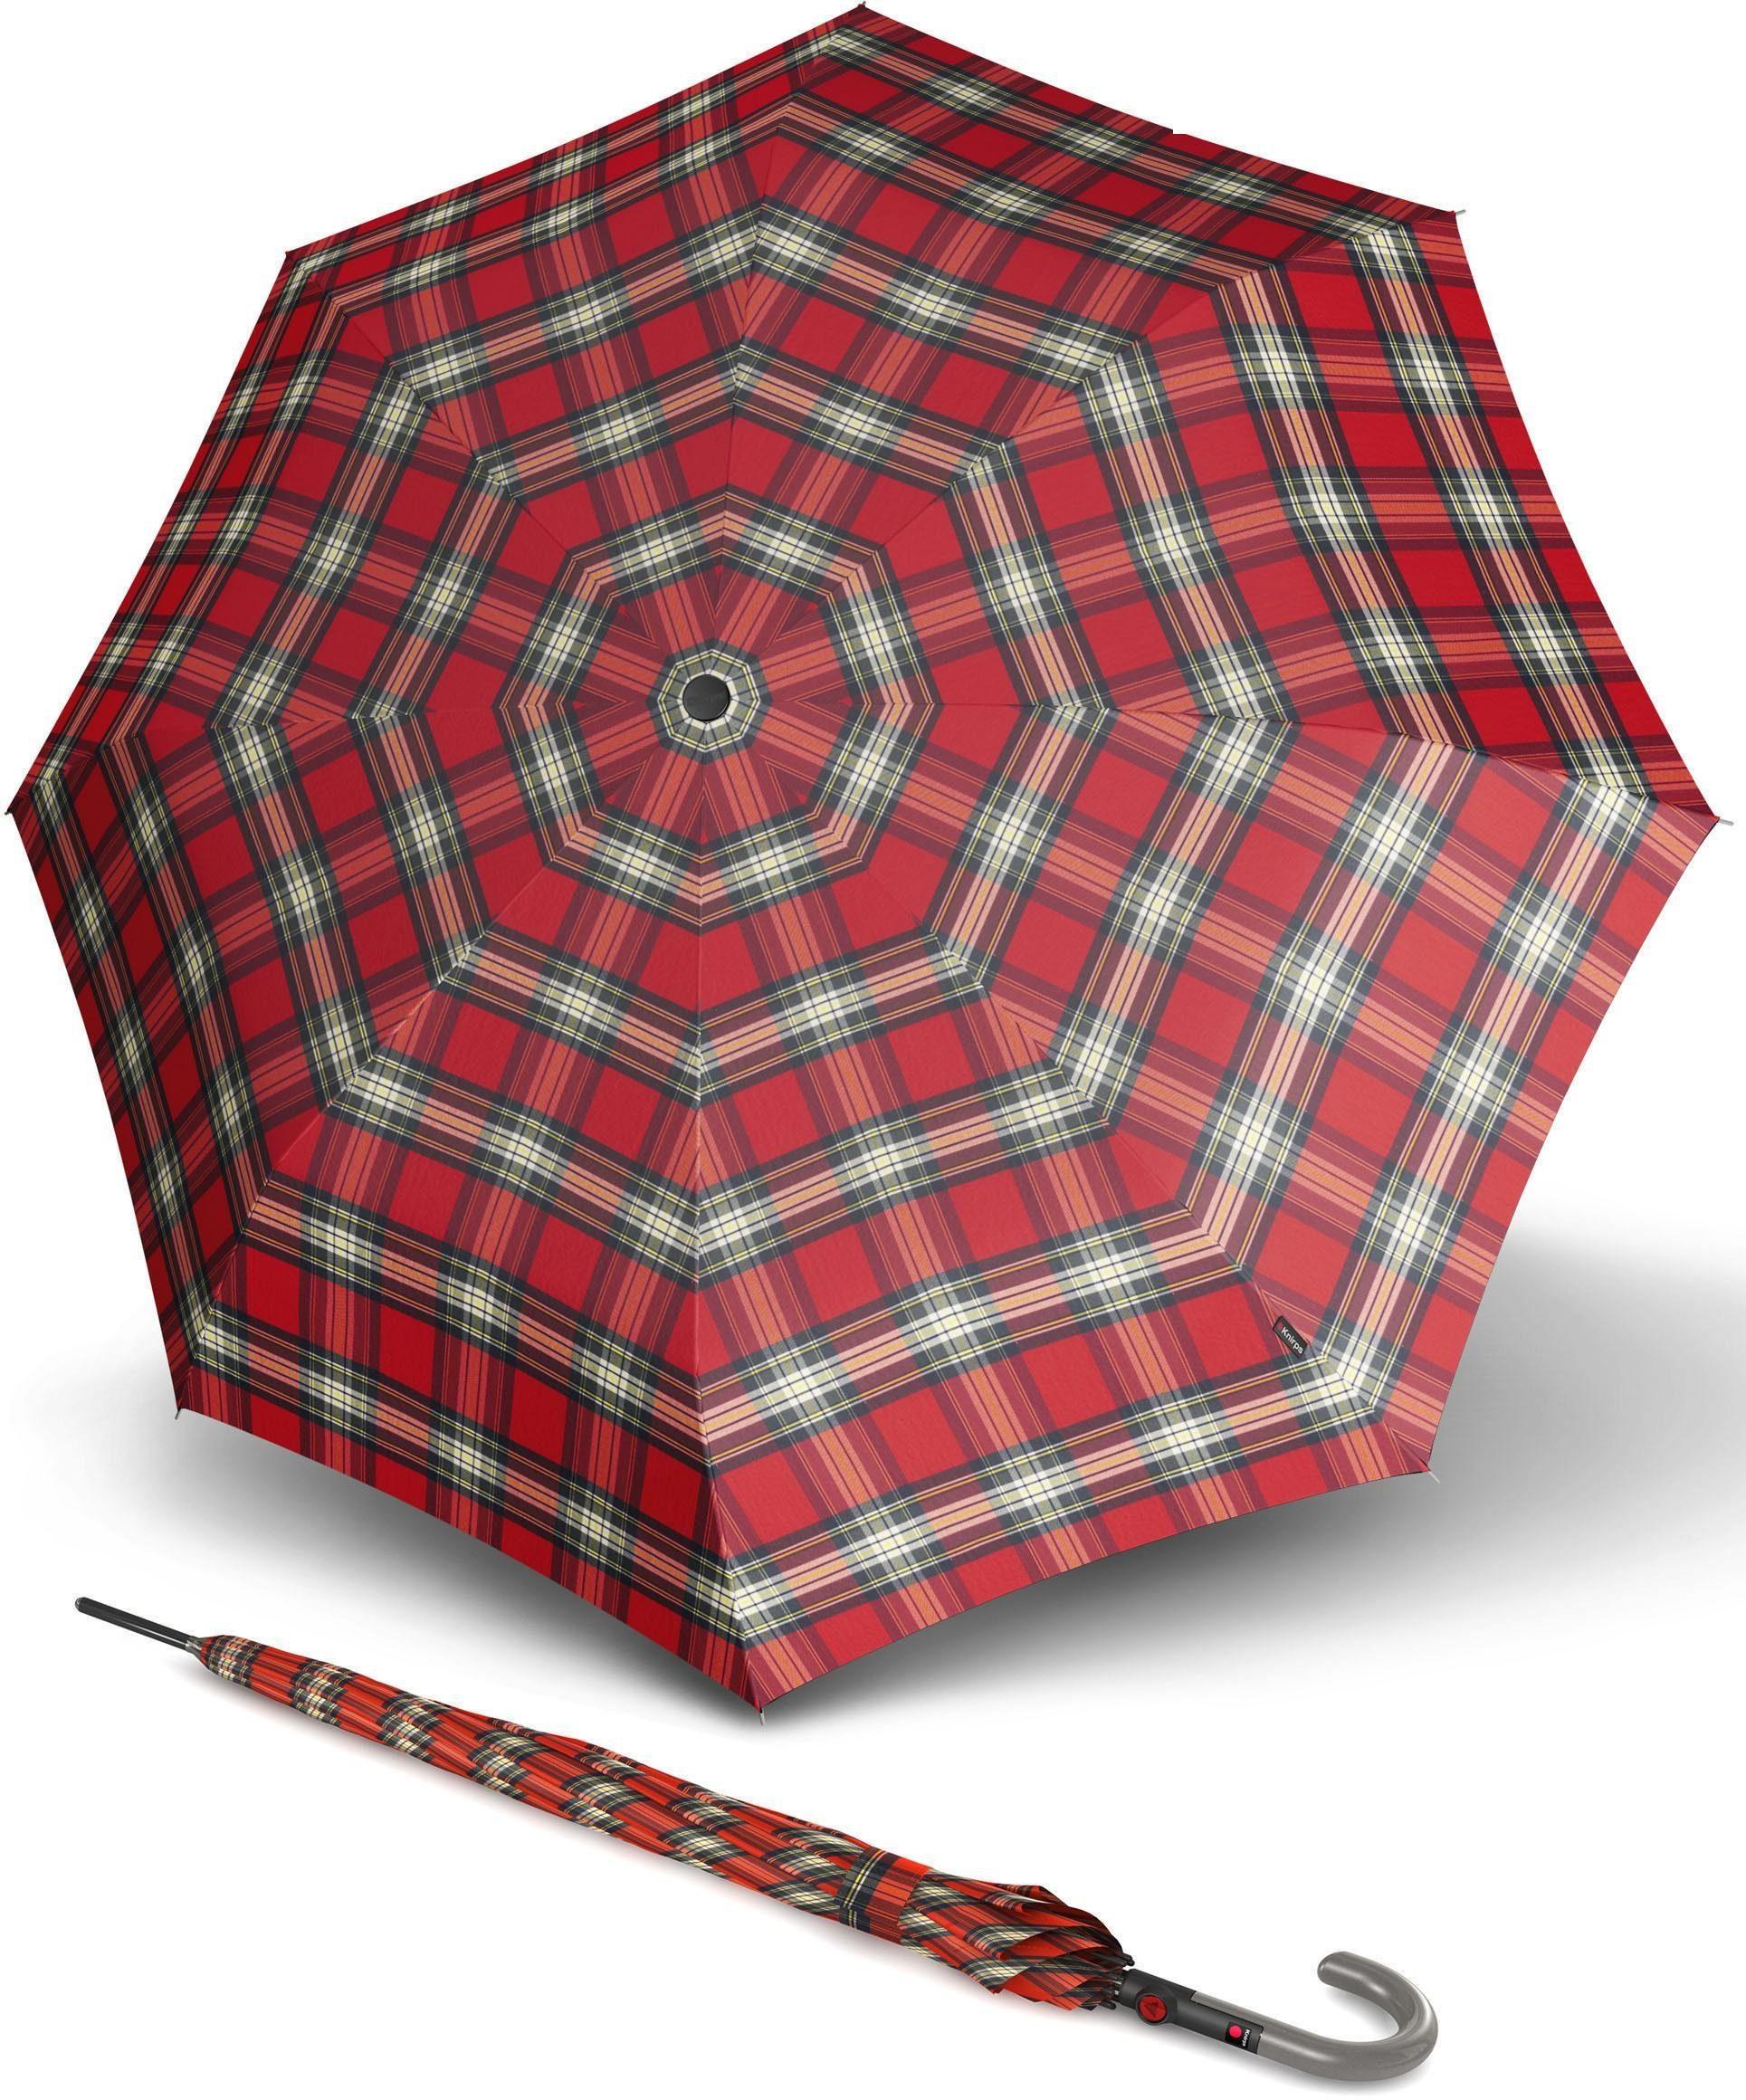 Knirps® Regenschirm - Langschirm, »T.703 Stick Automatic check red«